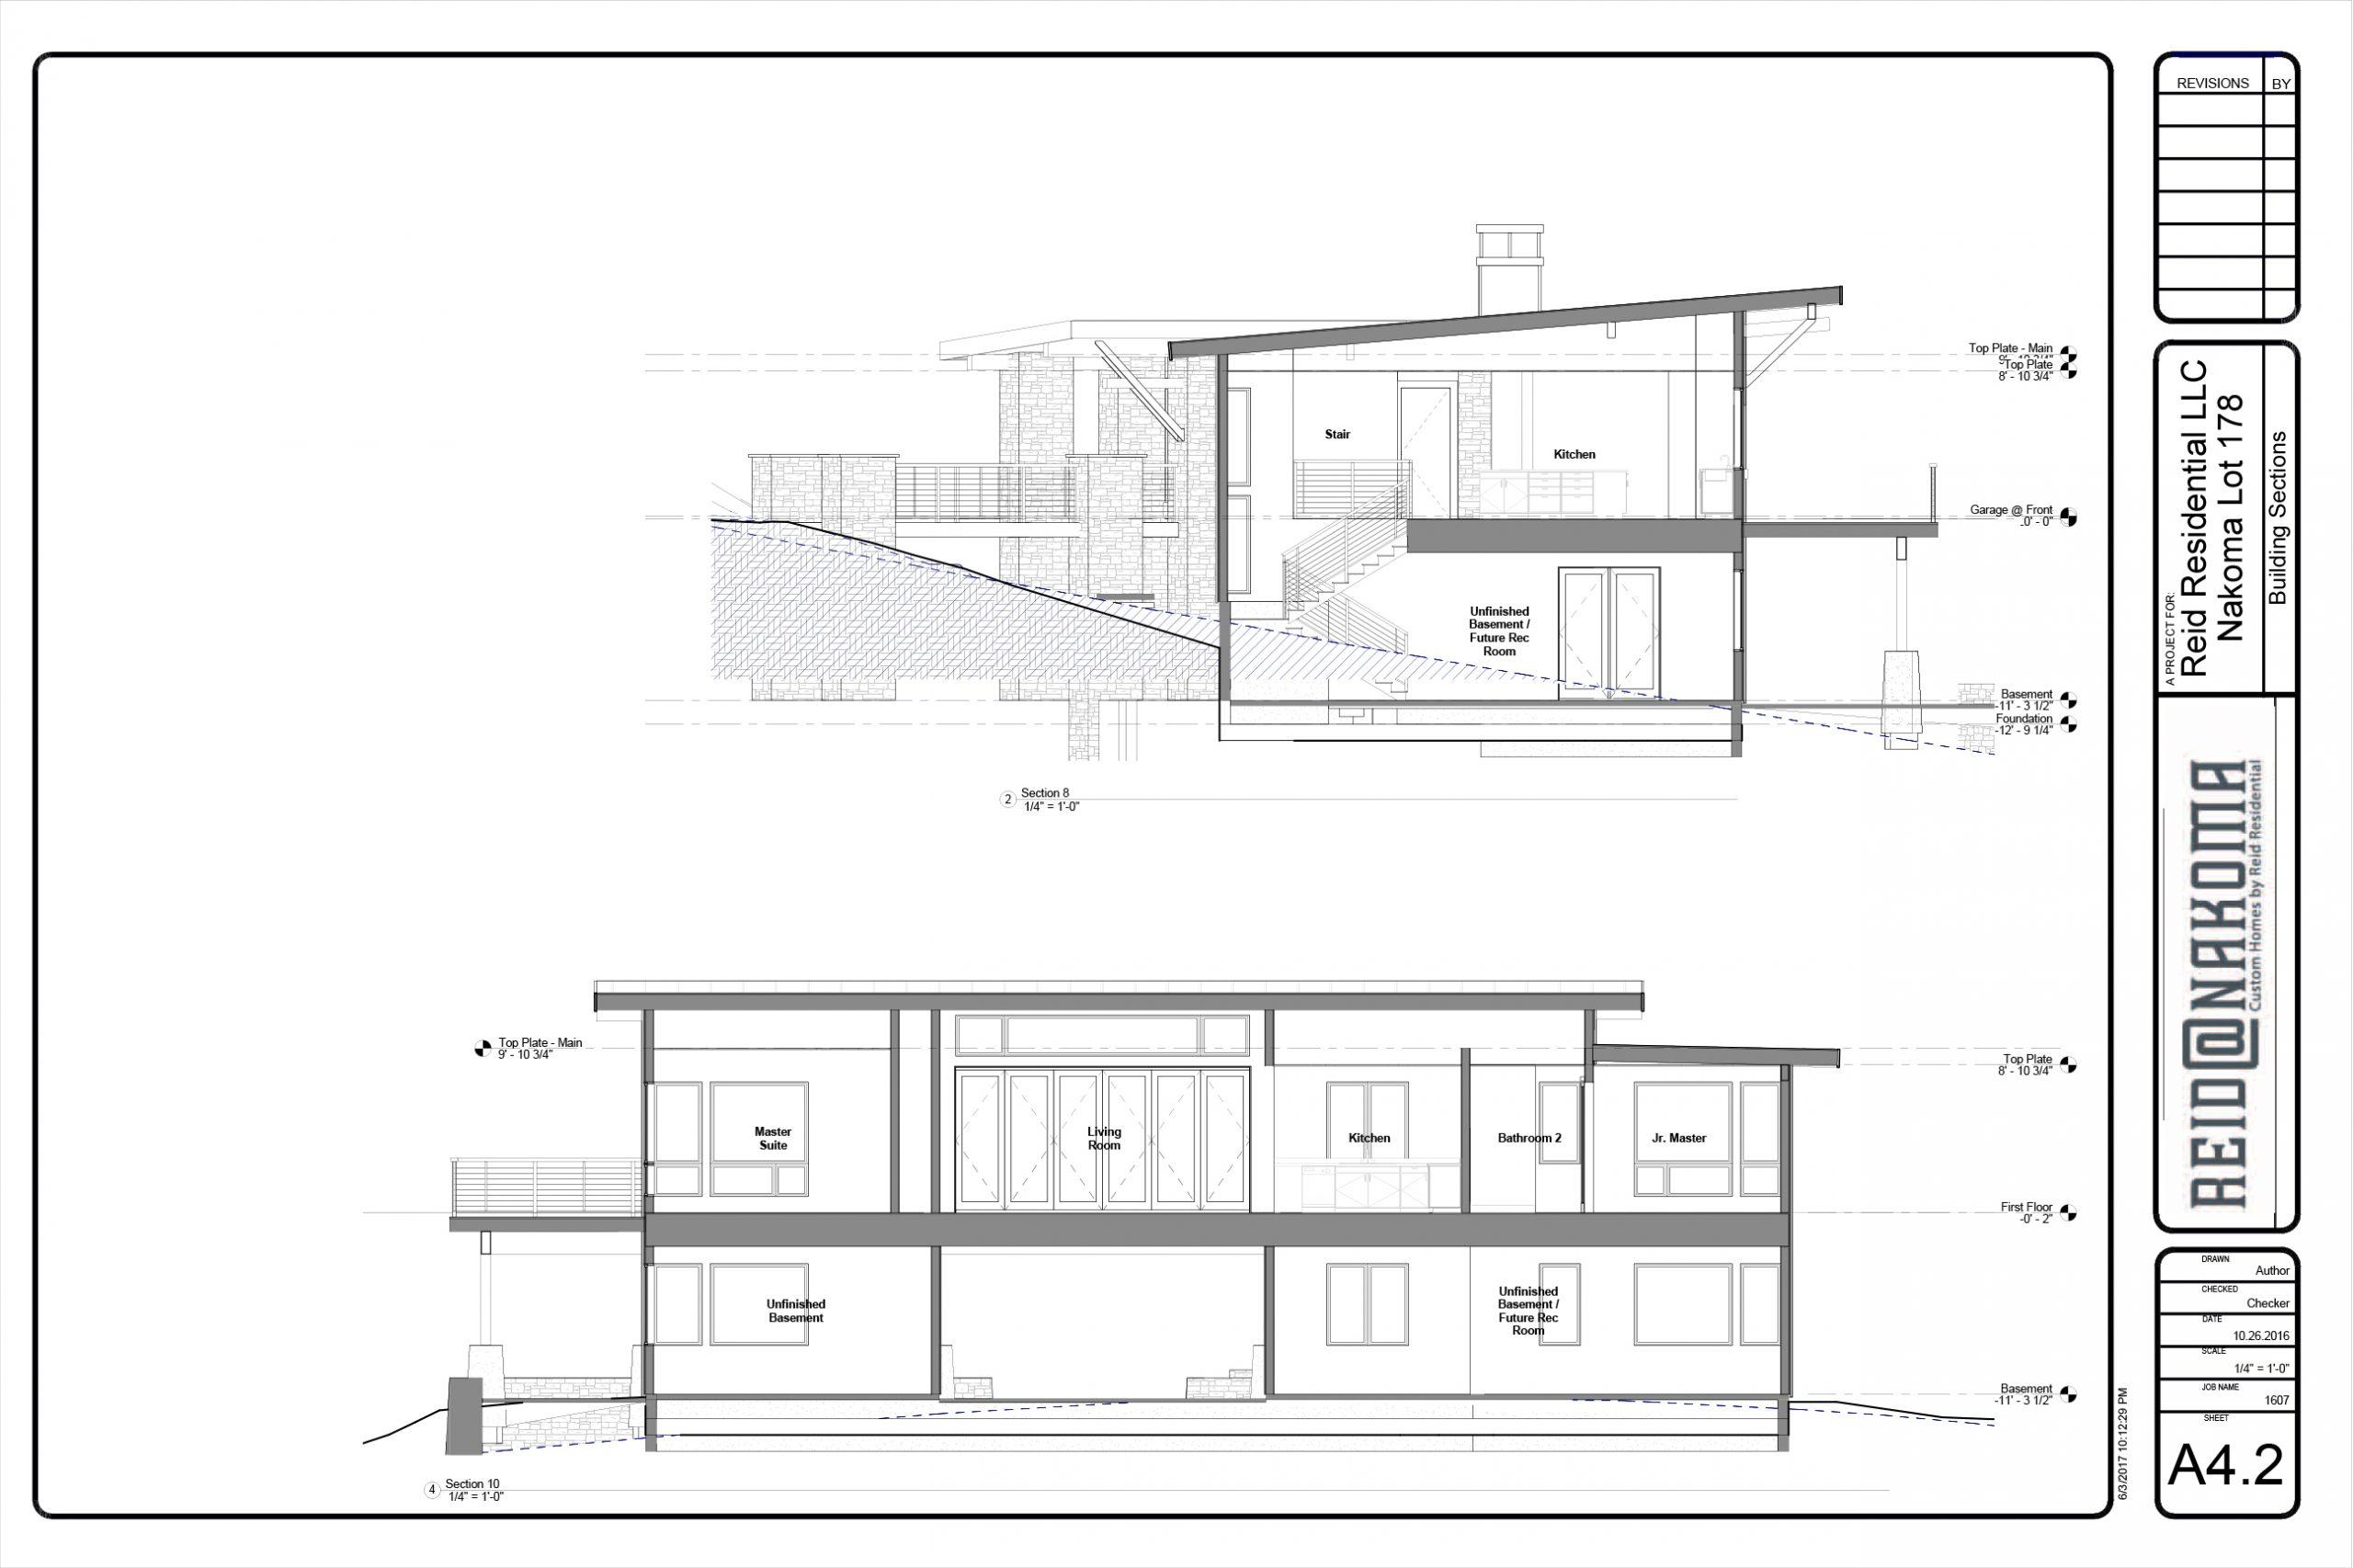 Nakoma_Lot178_Architectural 7